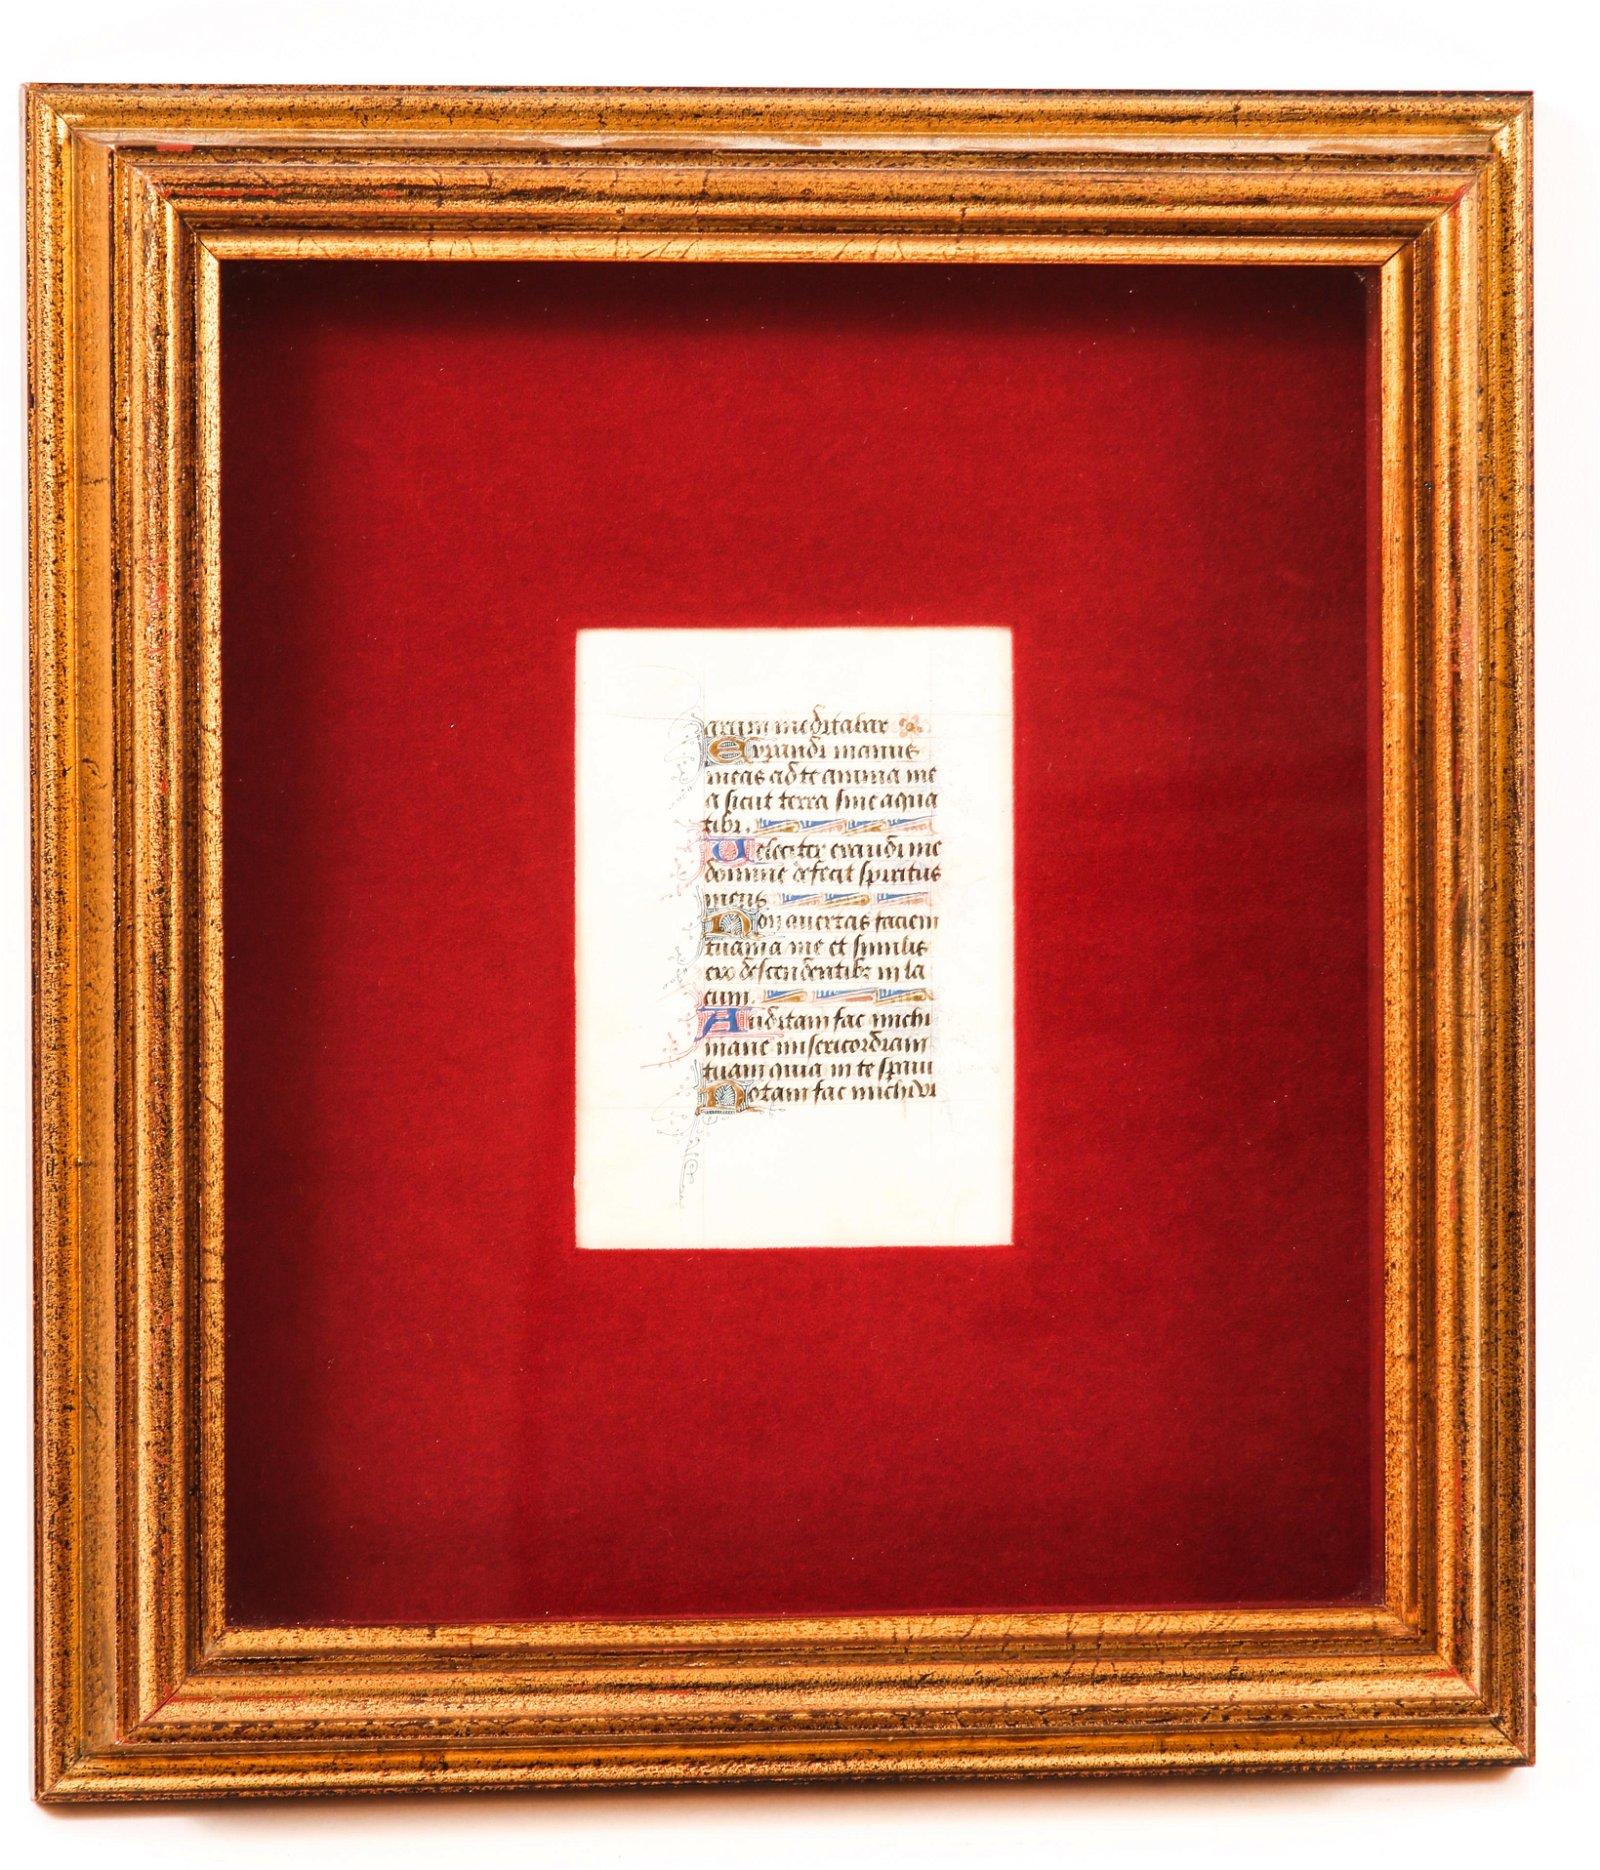 15th CENTURY BOOK OF HOURS MANUSCRIPT LEAF